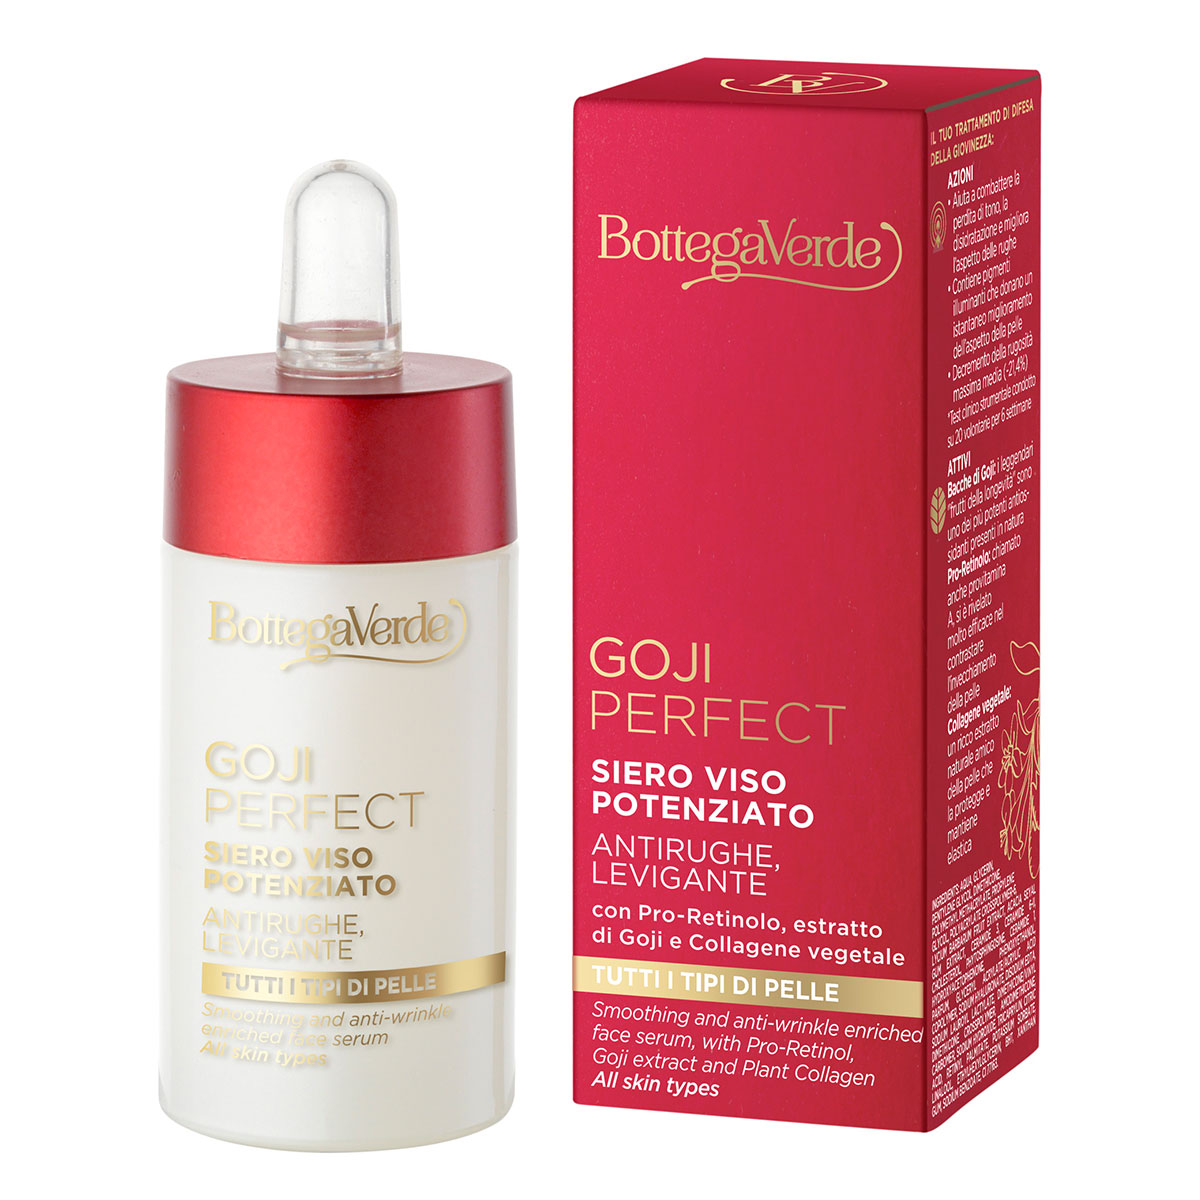 Ser antirid cu pro-retinol, extract de goji si colagen vegetal - Goji Perfect, 30 ML